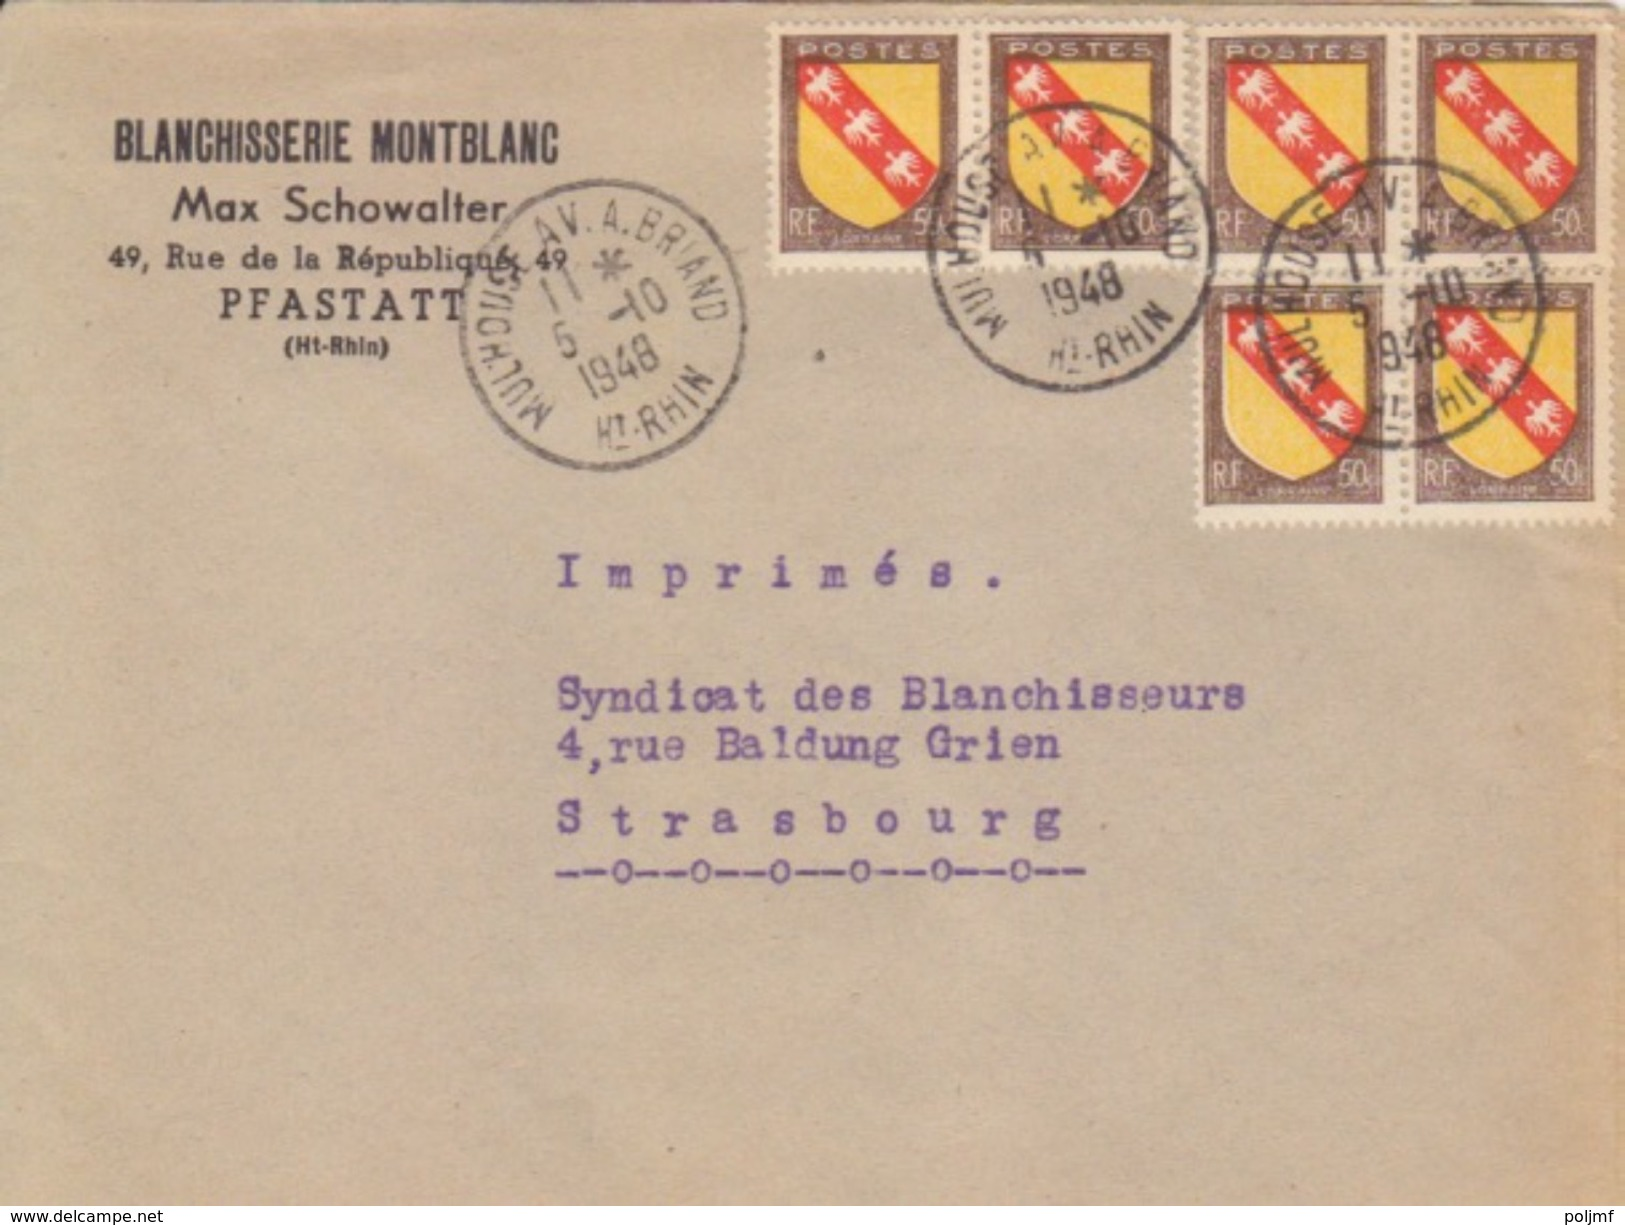 Haut Rhin, Lettre (blanchisserie Montblanc) 50c Blason Lorraine X 6 Obl. 5-10-48 Mulhouse Av. A. Briand Pour Strasbourg - Alsace-Lorraine